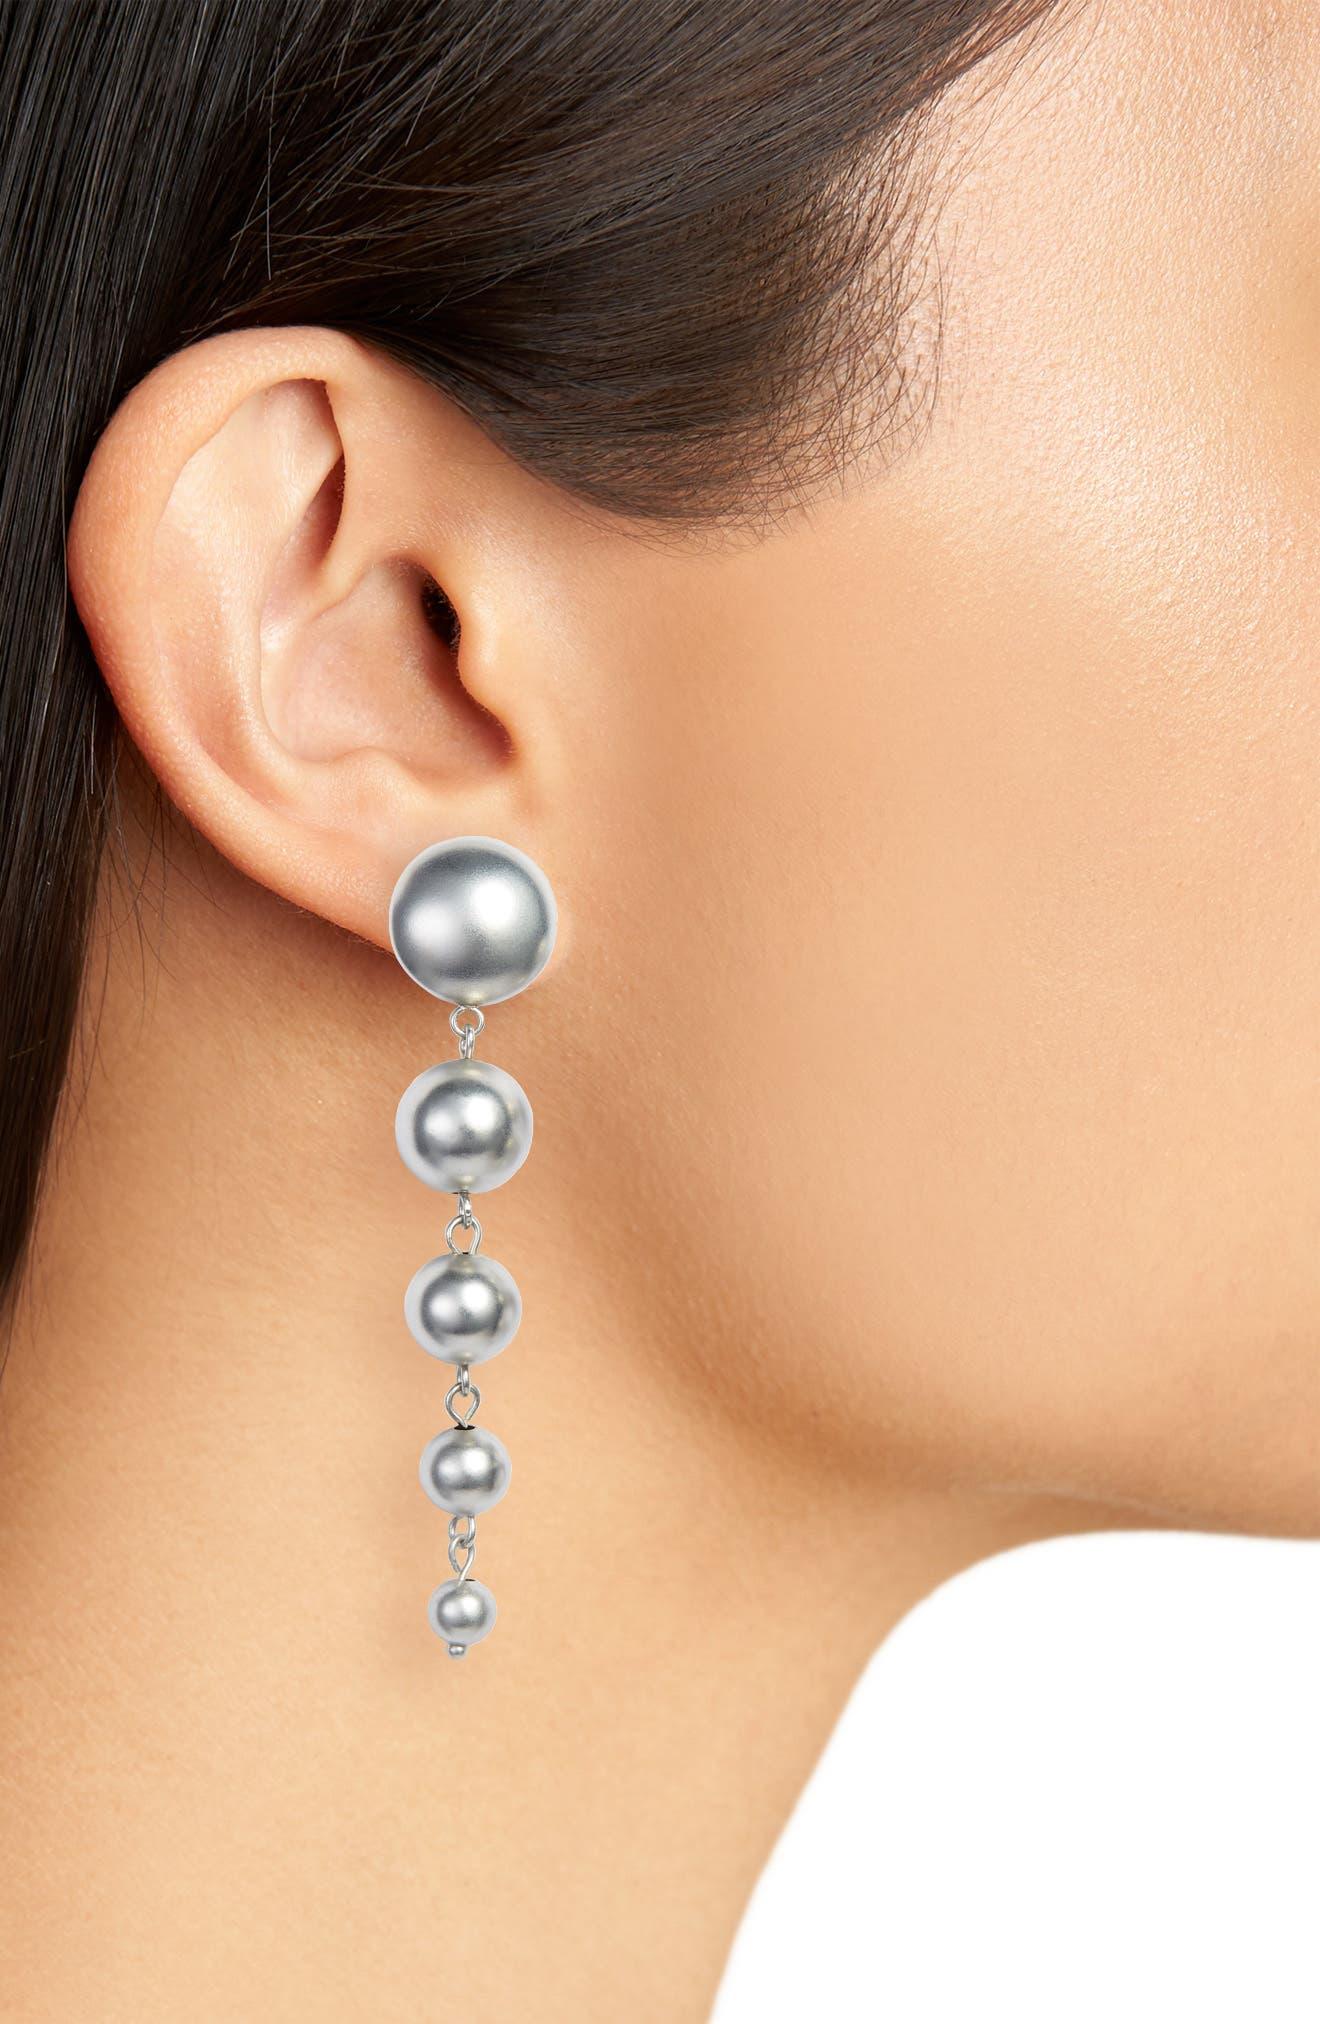 5-Sphere Graduated Drop Earrings,                             Alternate thumbnail 3, color,